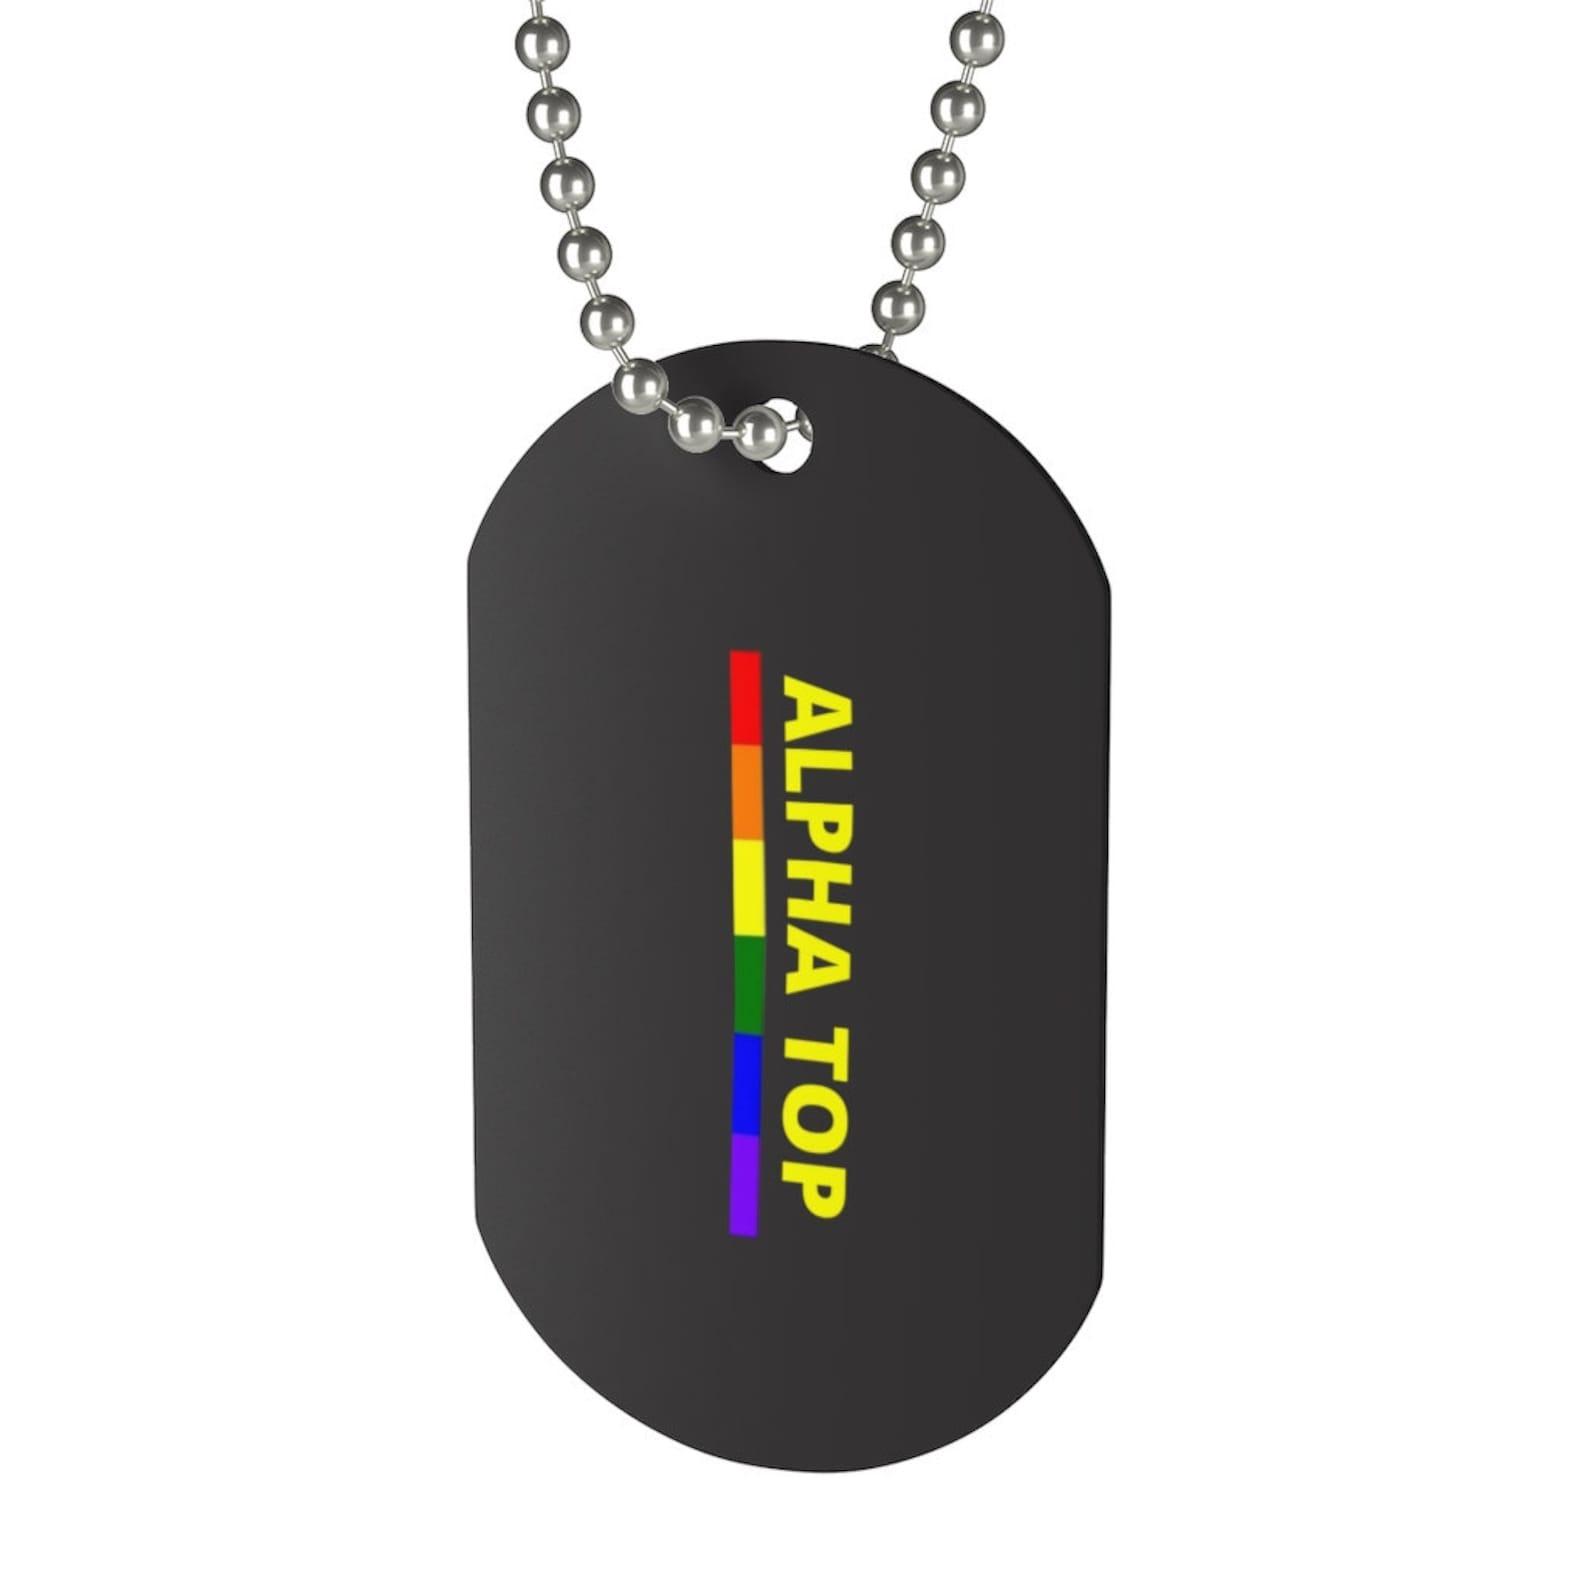 Alpha Top Regenbogen Gay Pride LGBT LGBTQ Sex Fetisch Kink